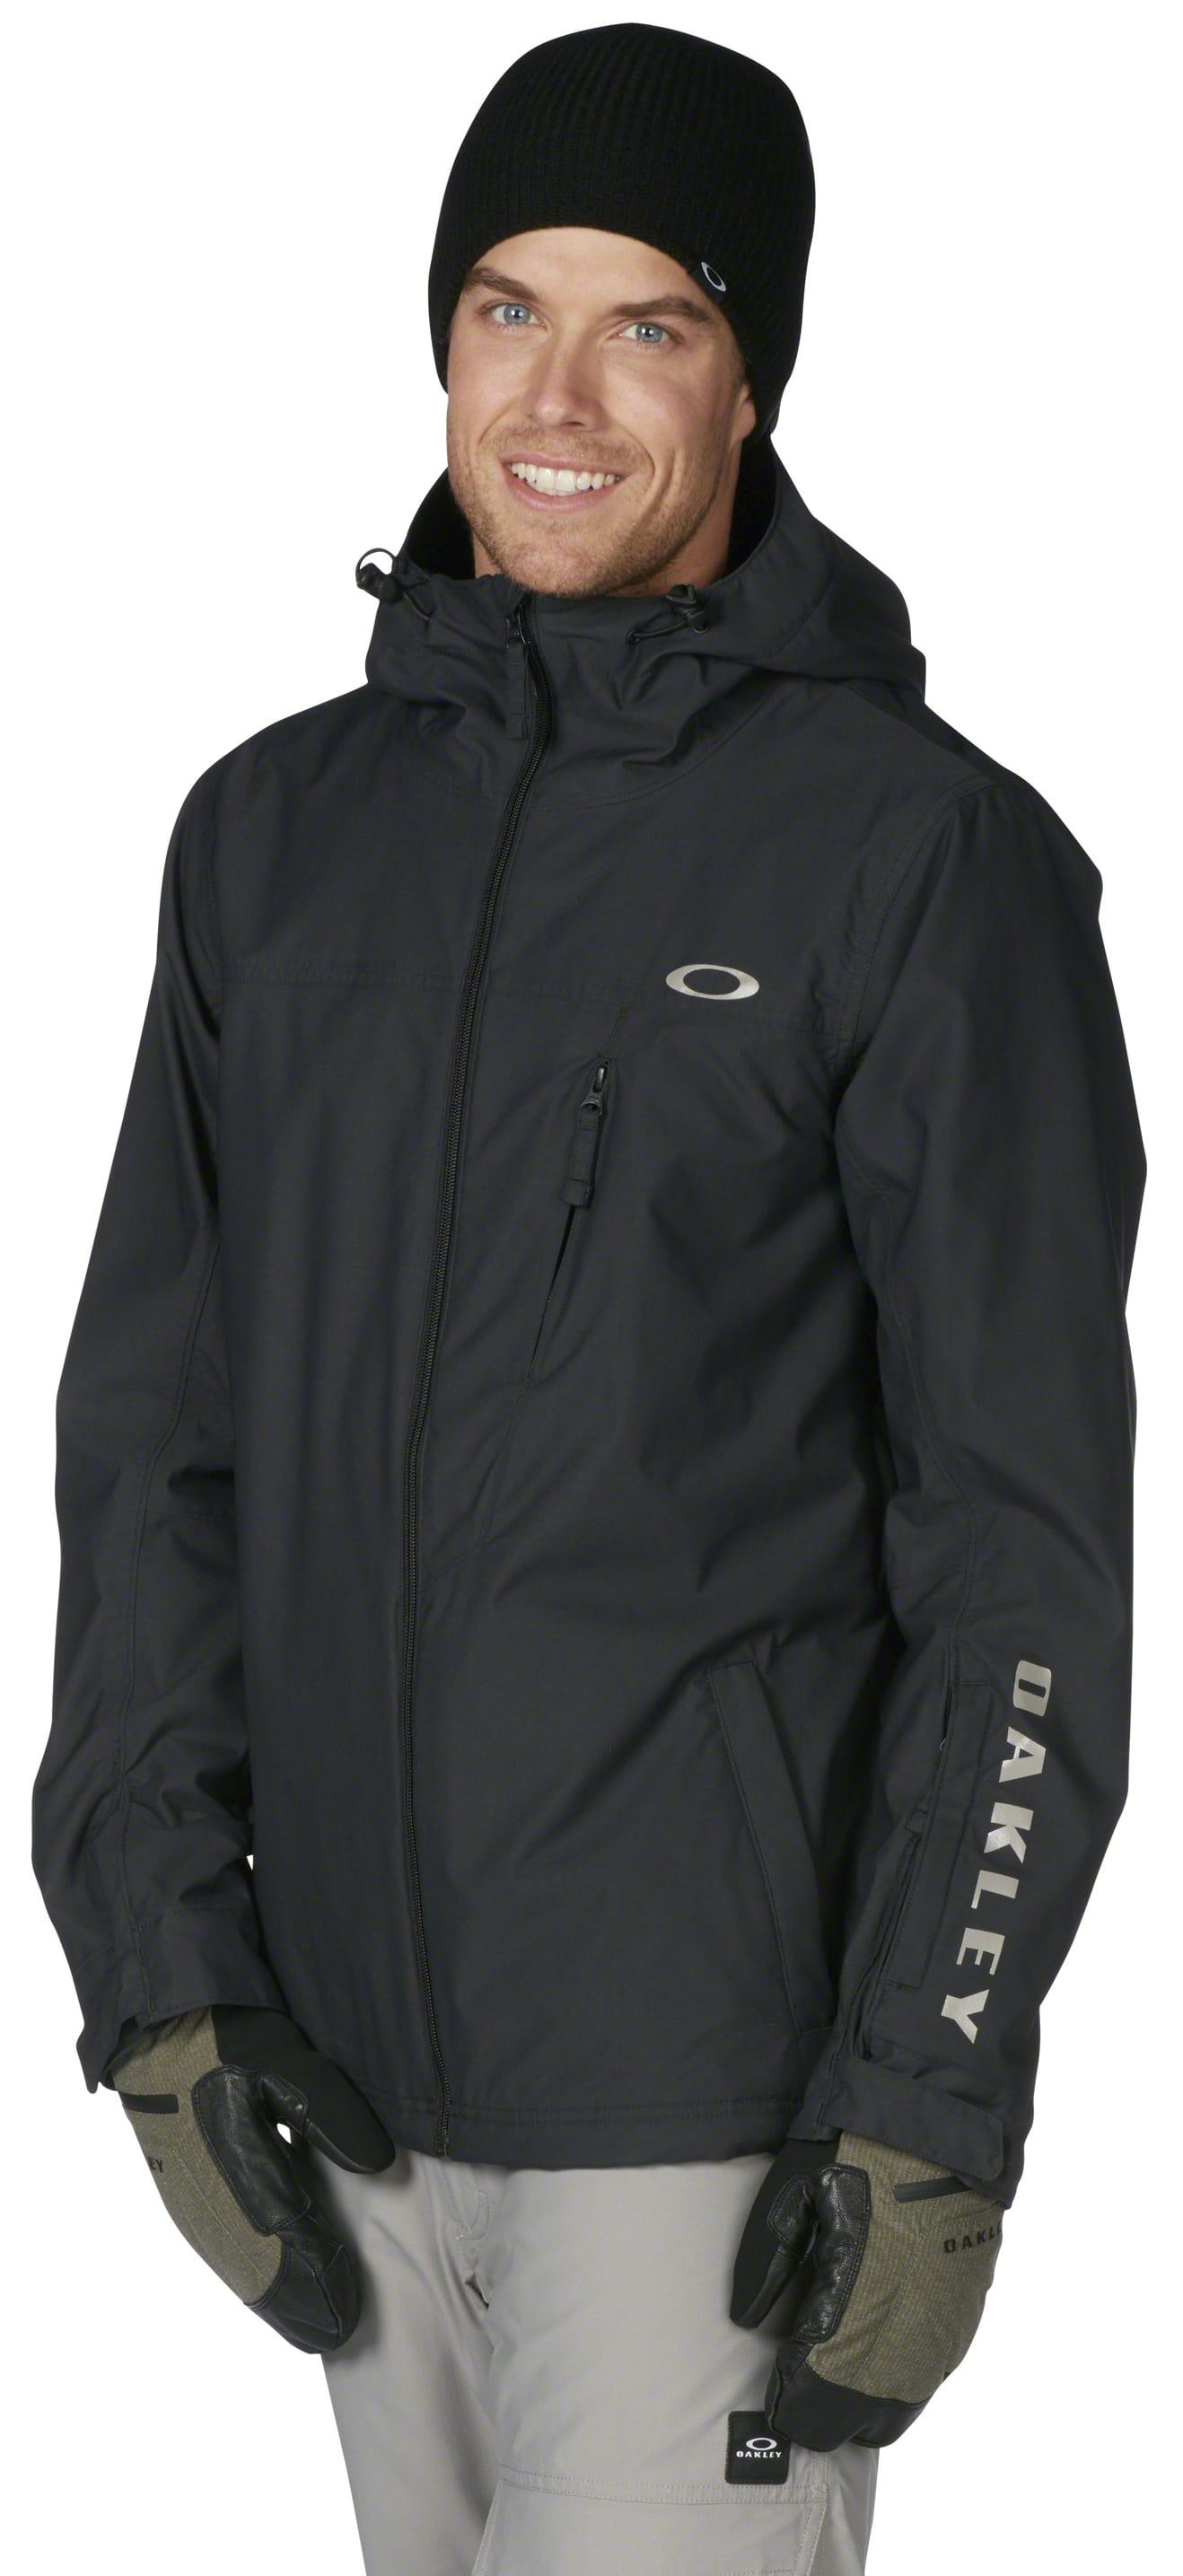 33c4472abb Oakley Crescent BioZone Shell Snowboard Jacket - thumbnail 2